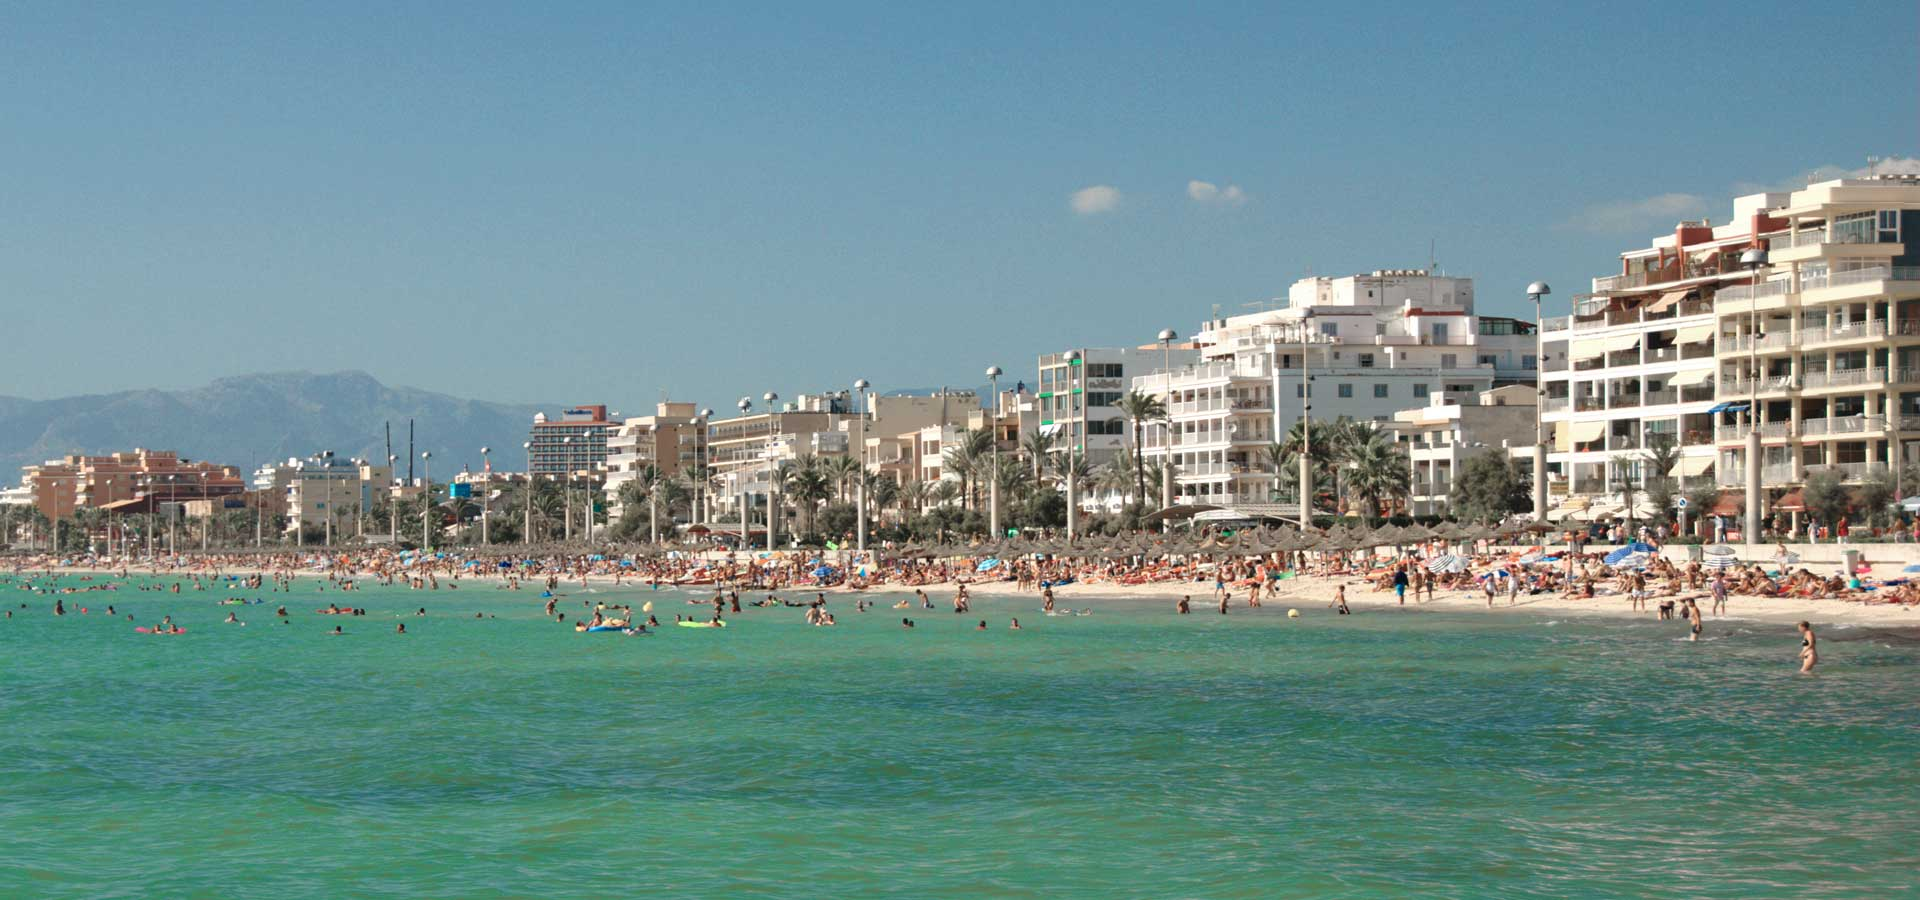 Playa de Palma property market.